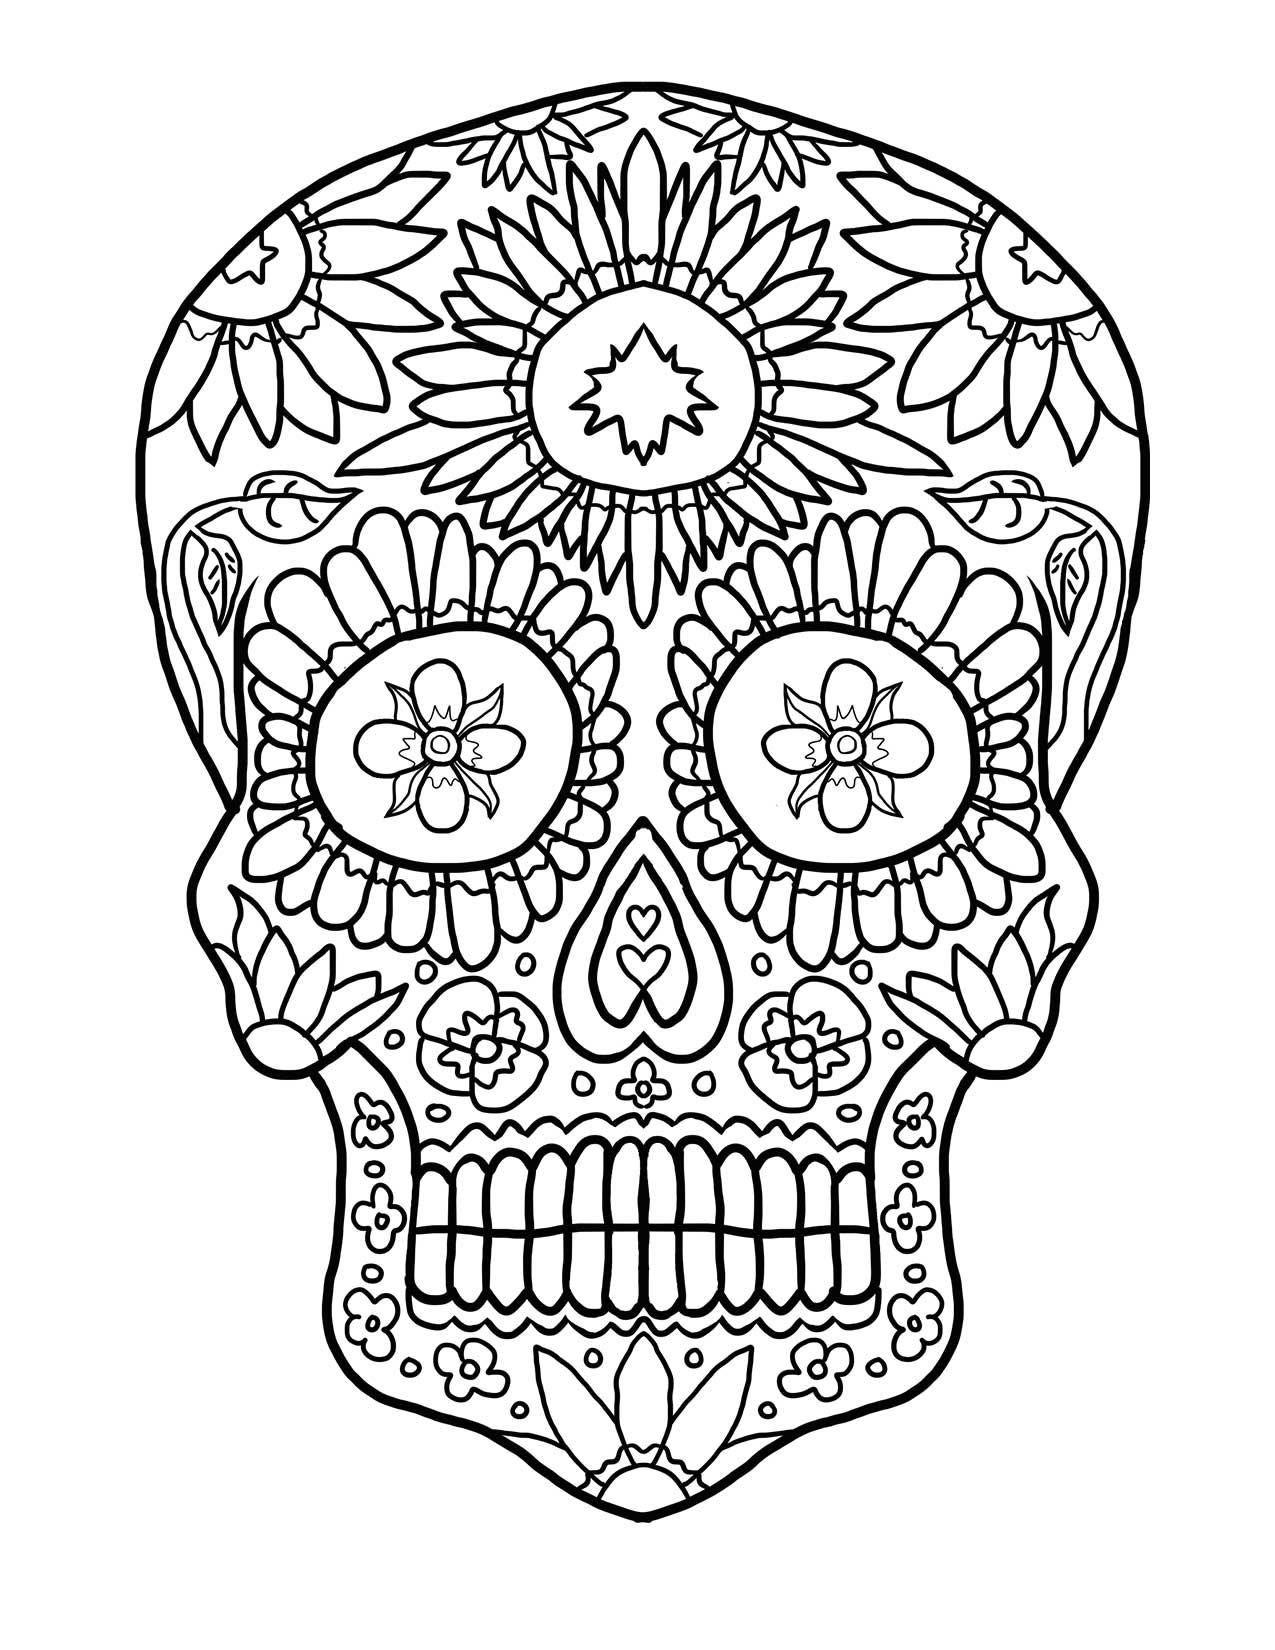 Dibujos de Calaveras para Colorear | DECALAVERAS.COM